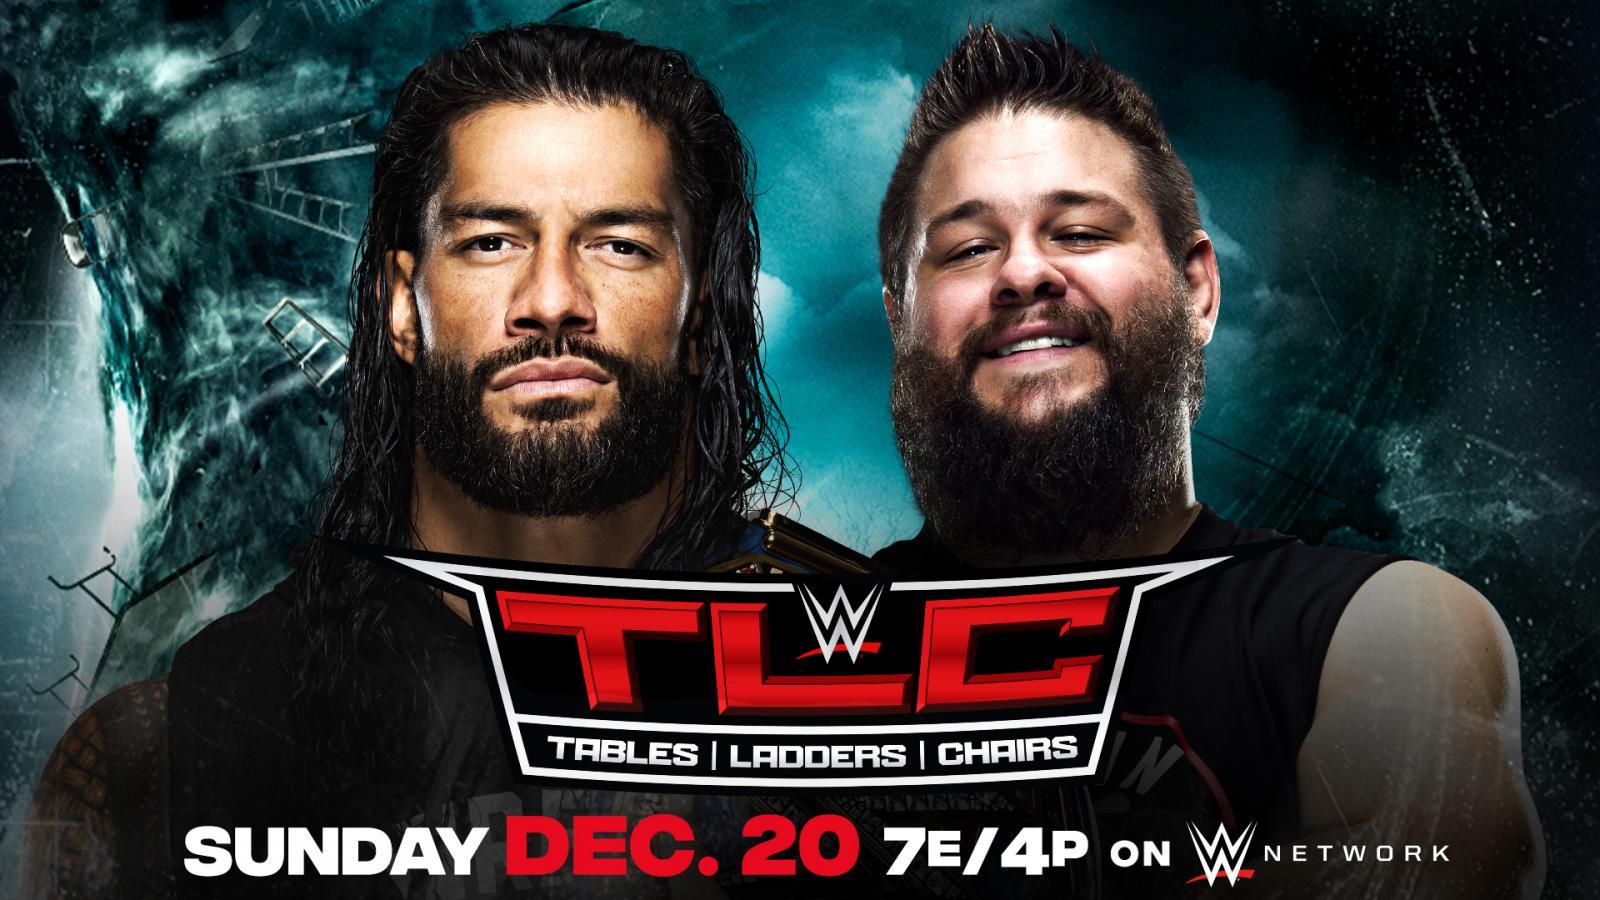 WWE TLC 2020 match card, tutti gli incontri: Roman Reigns vs Kevin Owens, Drew McIntyre vs Aj Styles